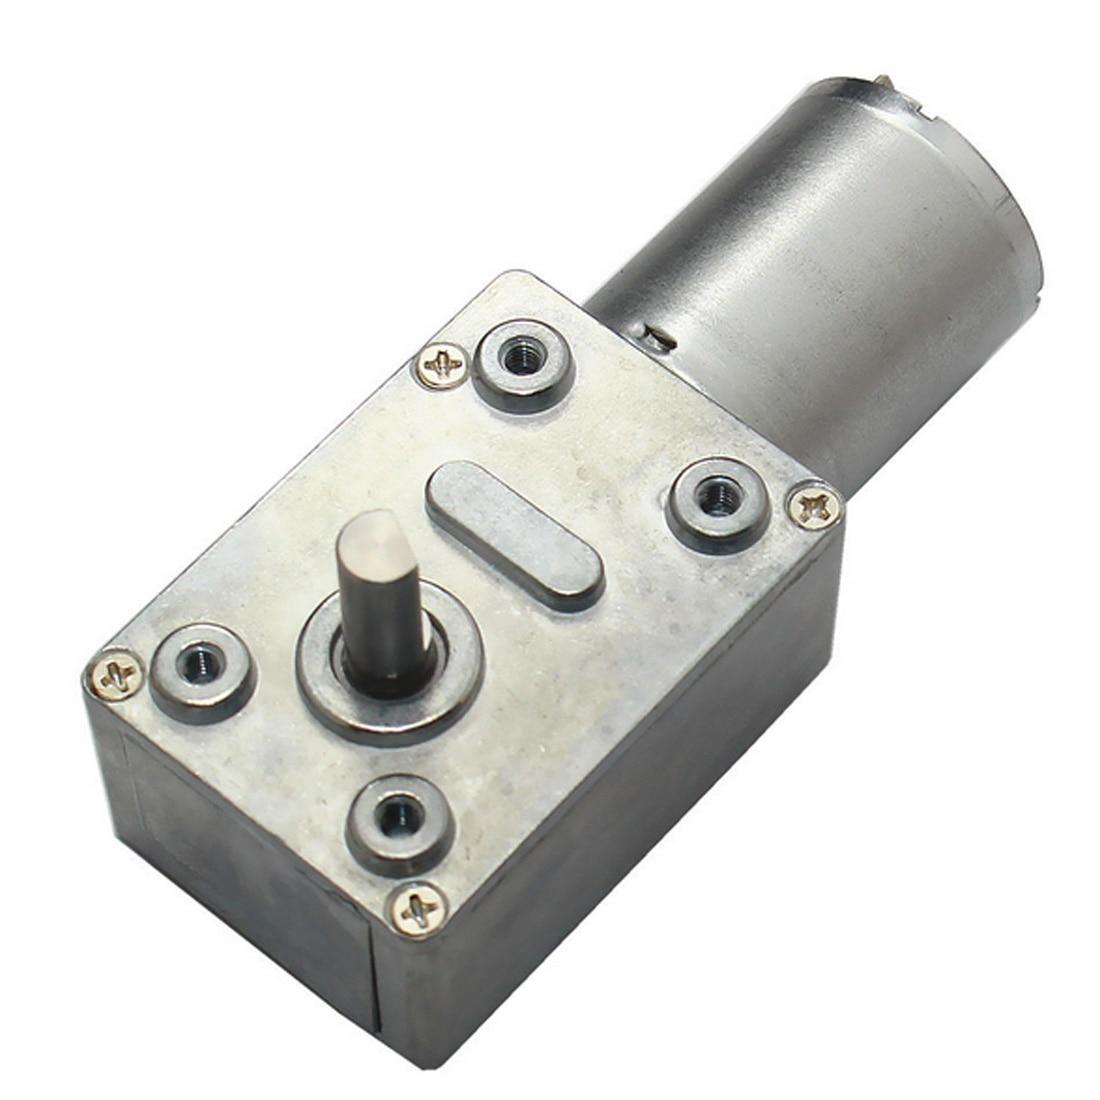 3V DC 100RPM High Torque Electric Gear Box Motor